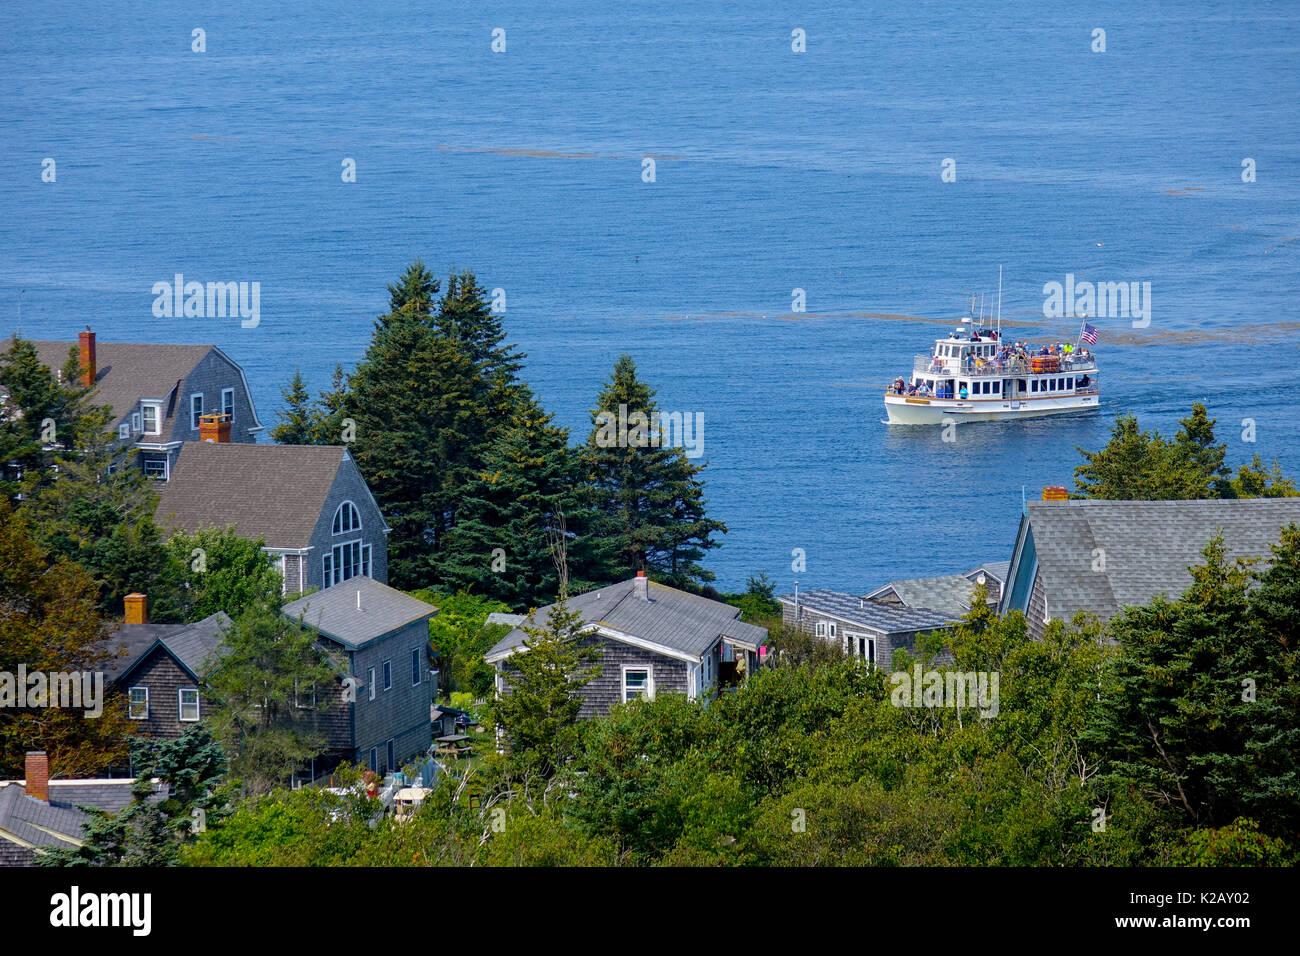 usa-maine-me-monhegan-island-in-penobscot-bay-in-the-atlantic-ocean-K2AY02.jpg